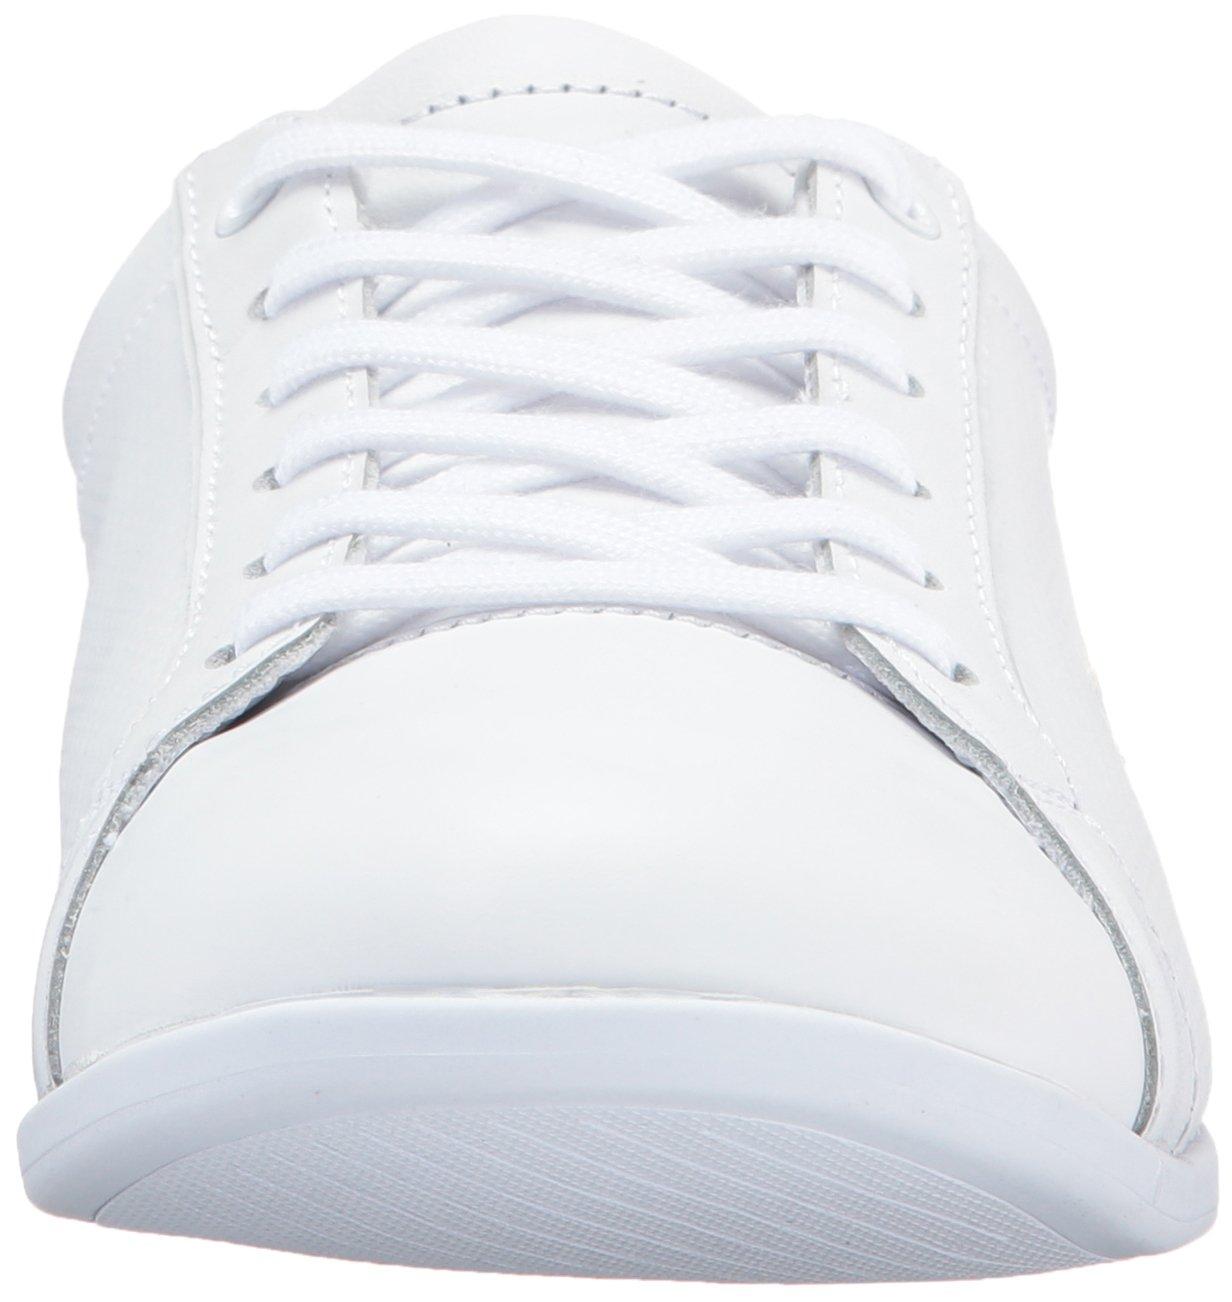 Lacoste Women's Rey Lace 317 1 Caw B01MR2CAR7 7 B(M) US White